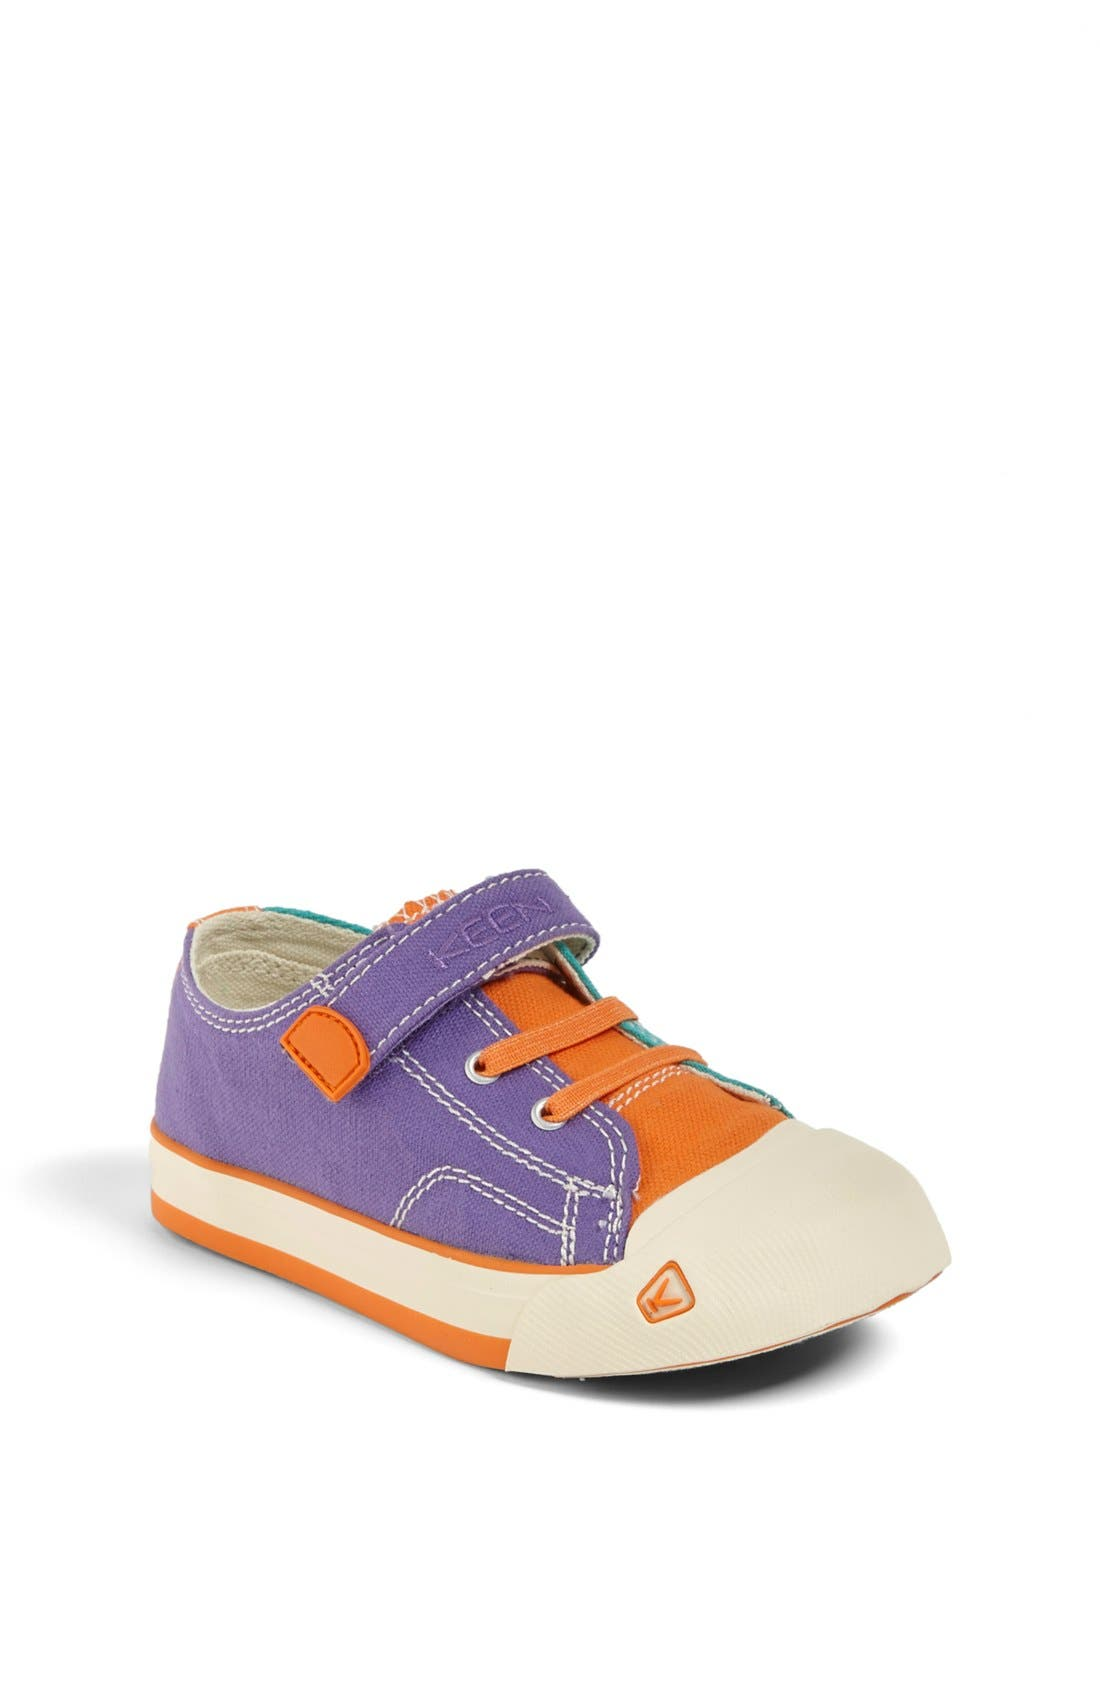 Main Image - Keen 'Coronado' Sneaker (Toddler & Little Kid)